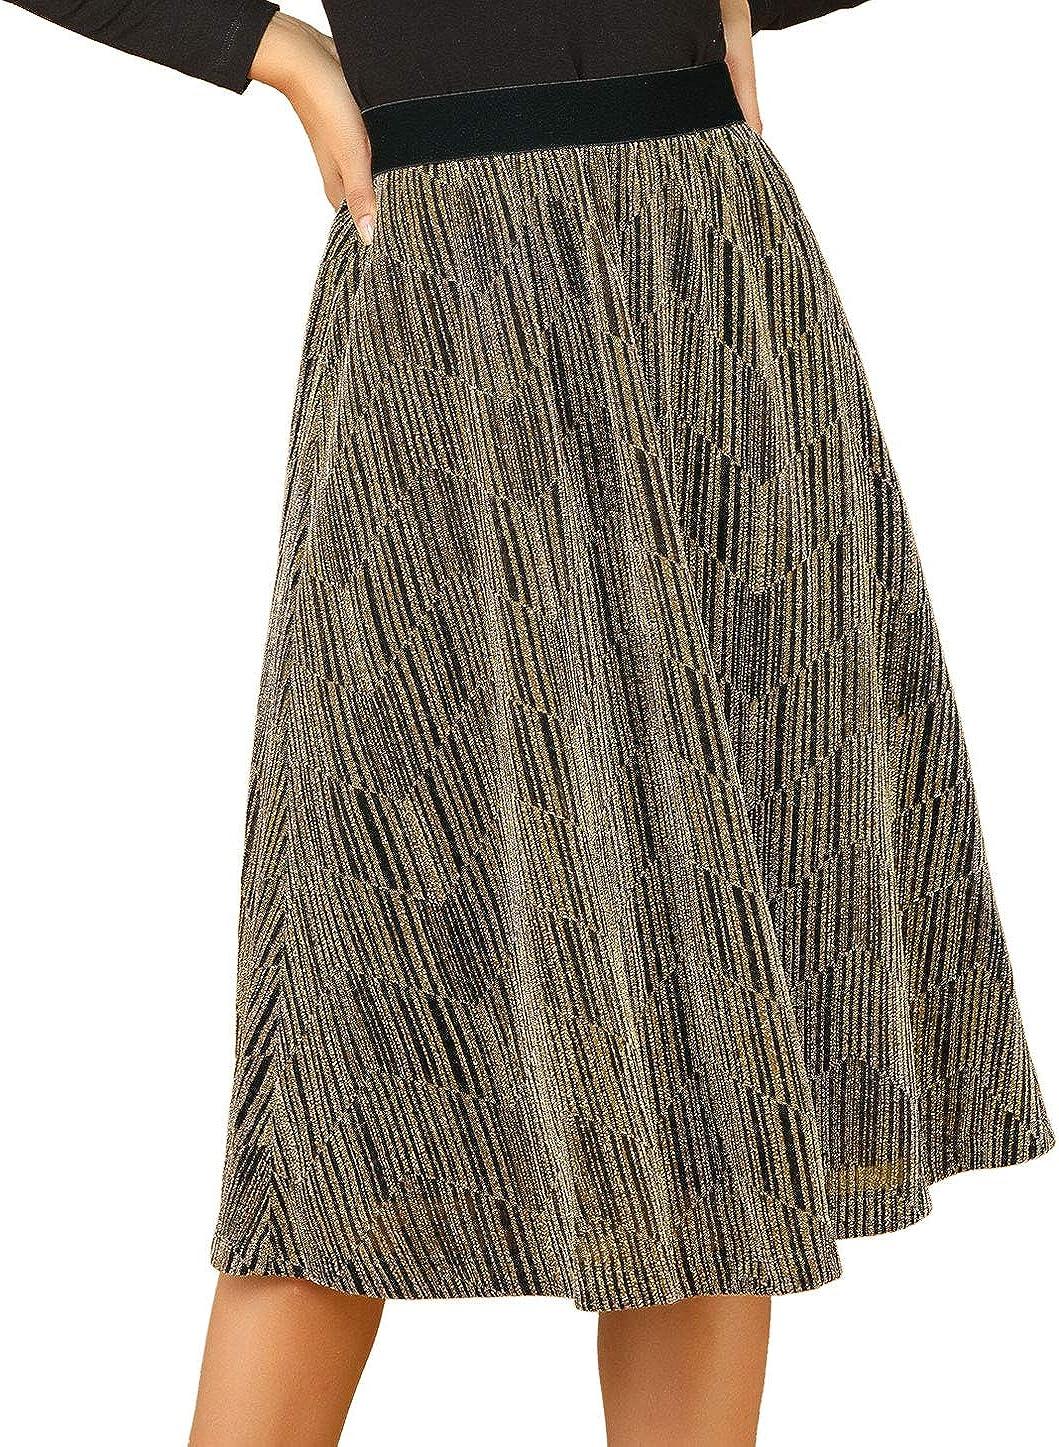 Allegra K Women's High Elastic Waist Metallic Chain Dance Flare Party Midi Skirt